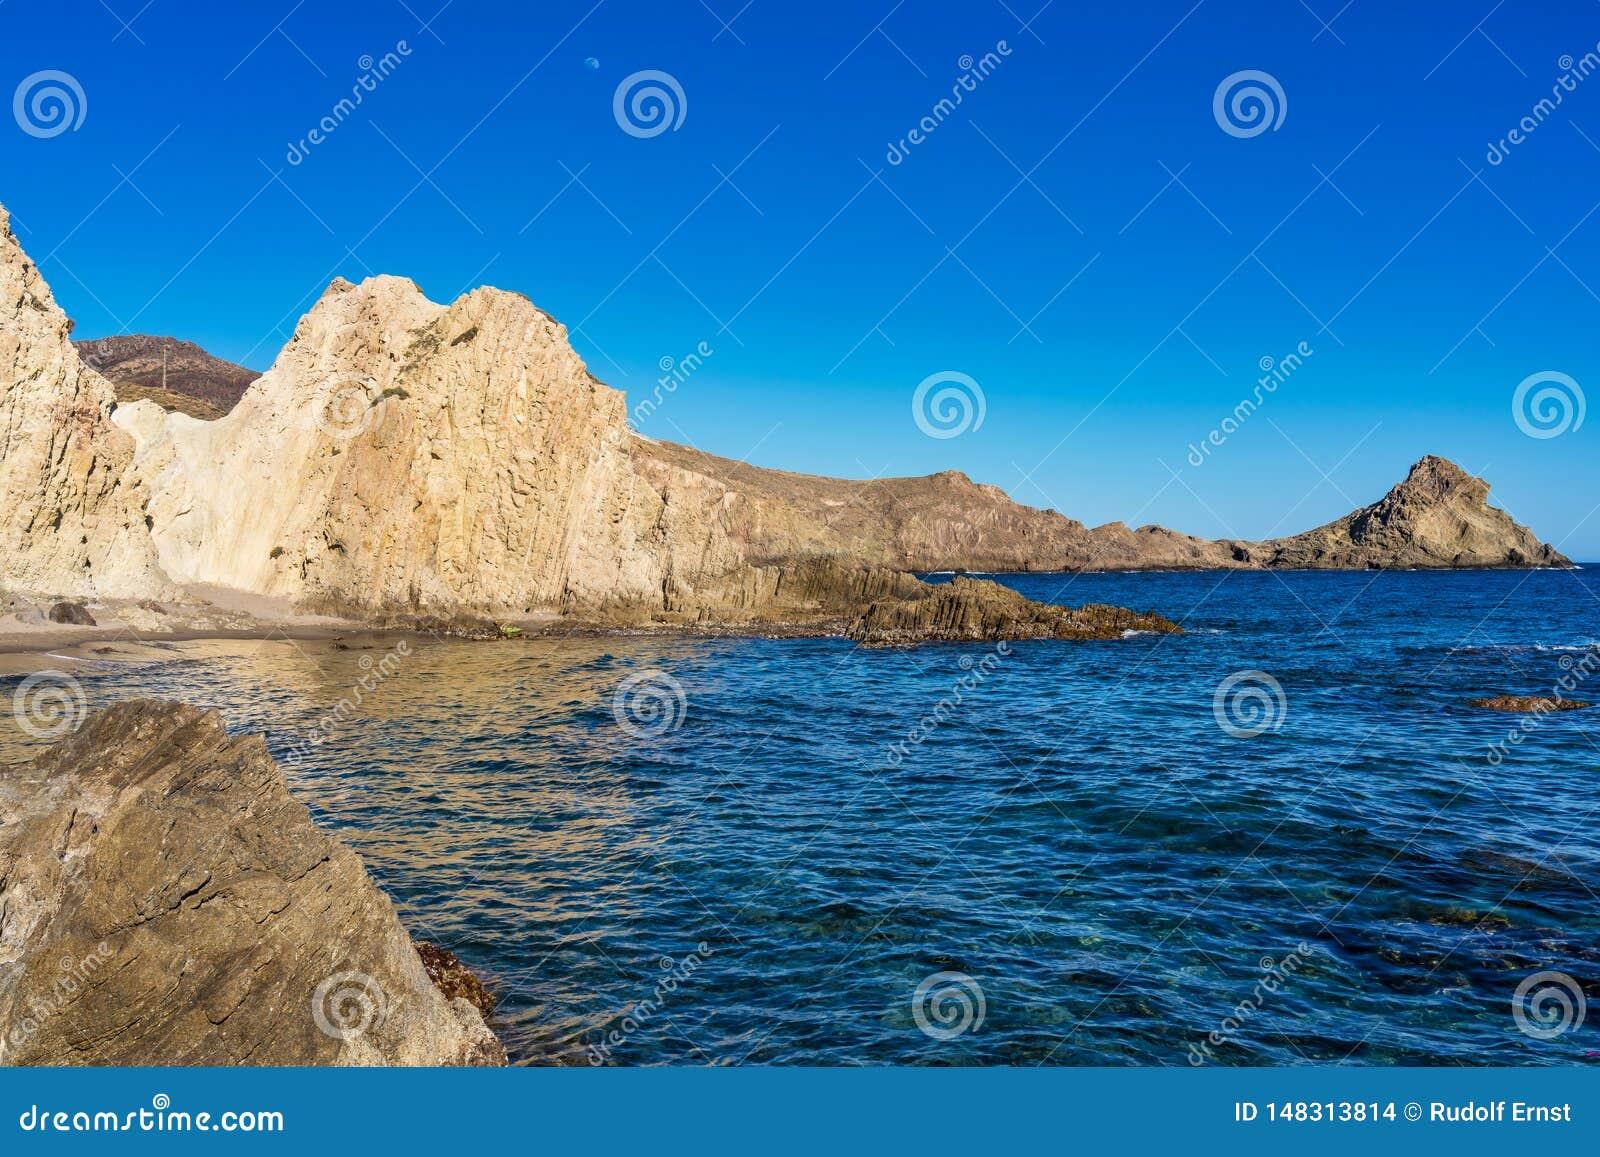 Rocky Coast di Cabo de Gata Nijar Park, Almeria, Spagna